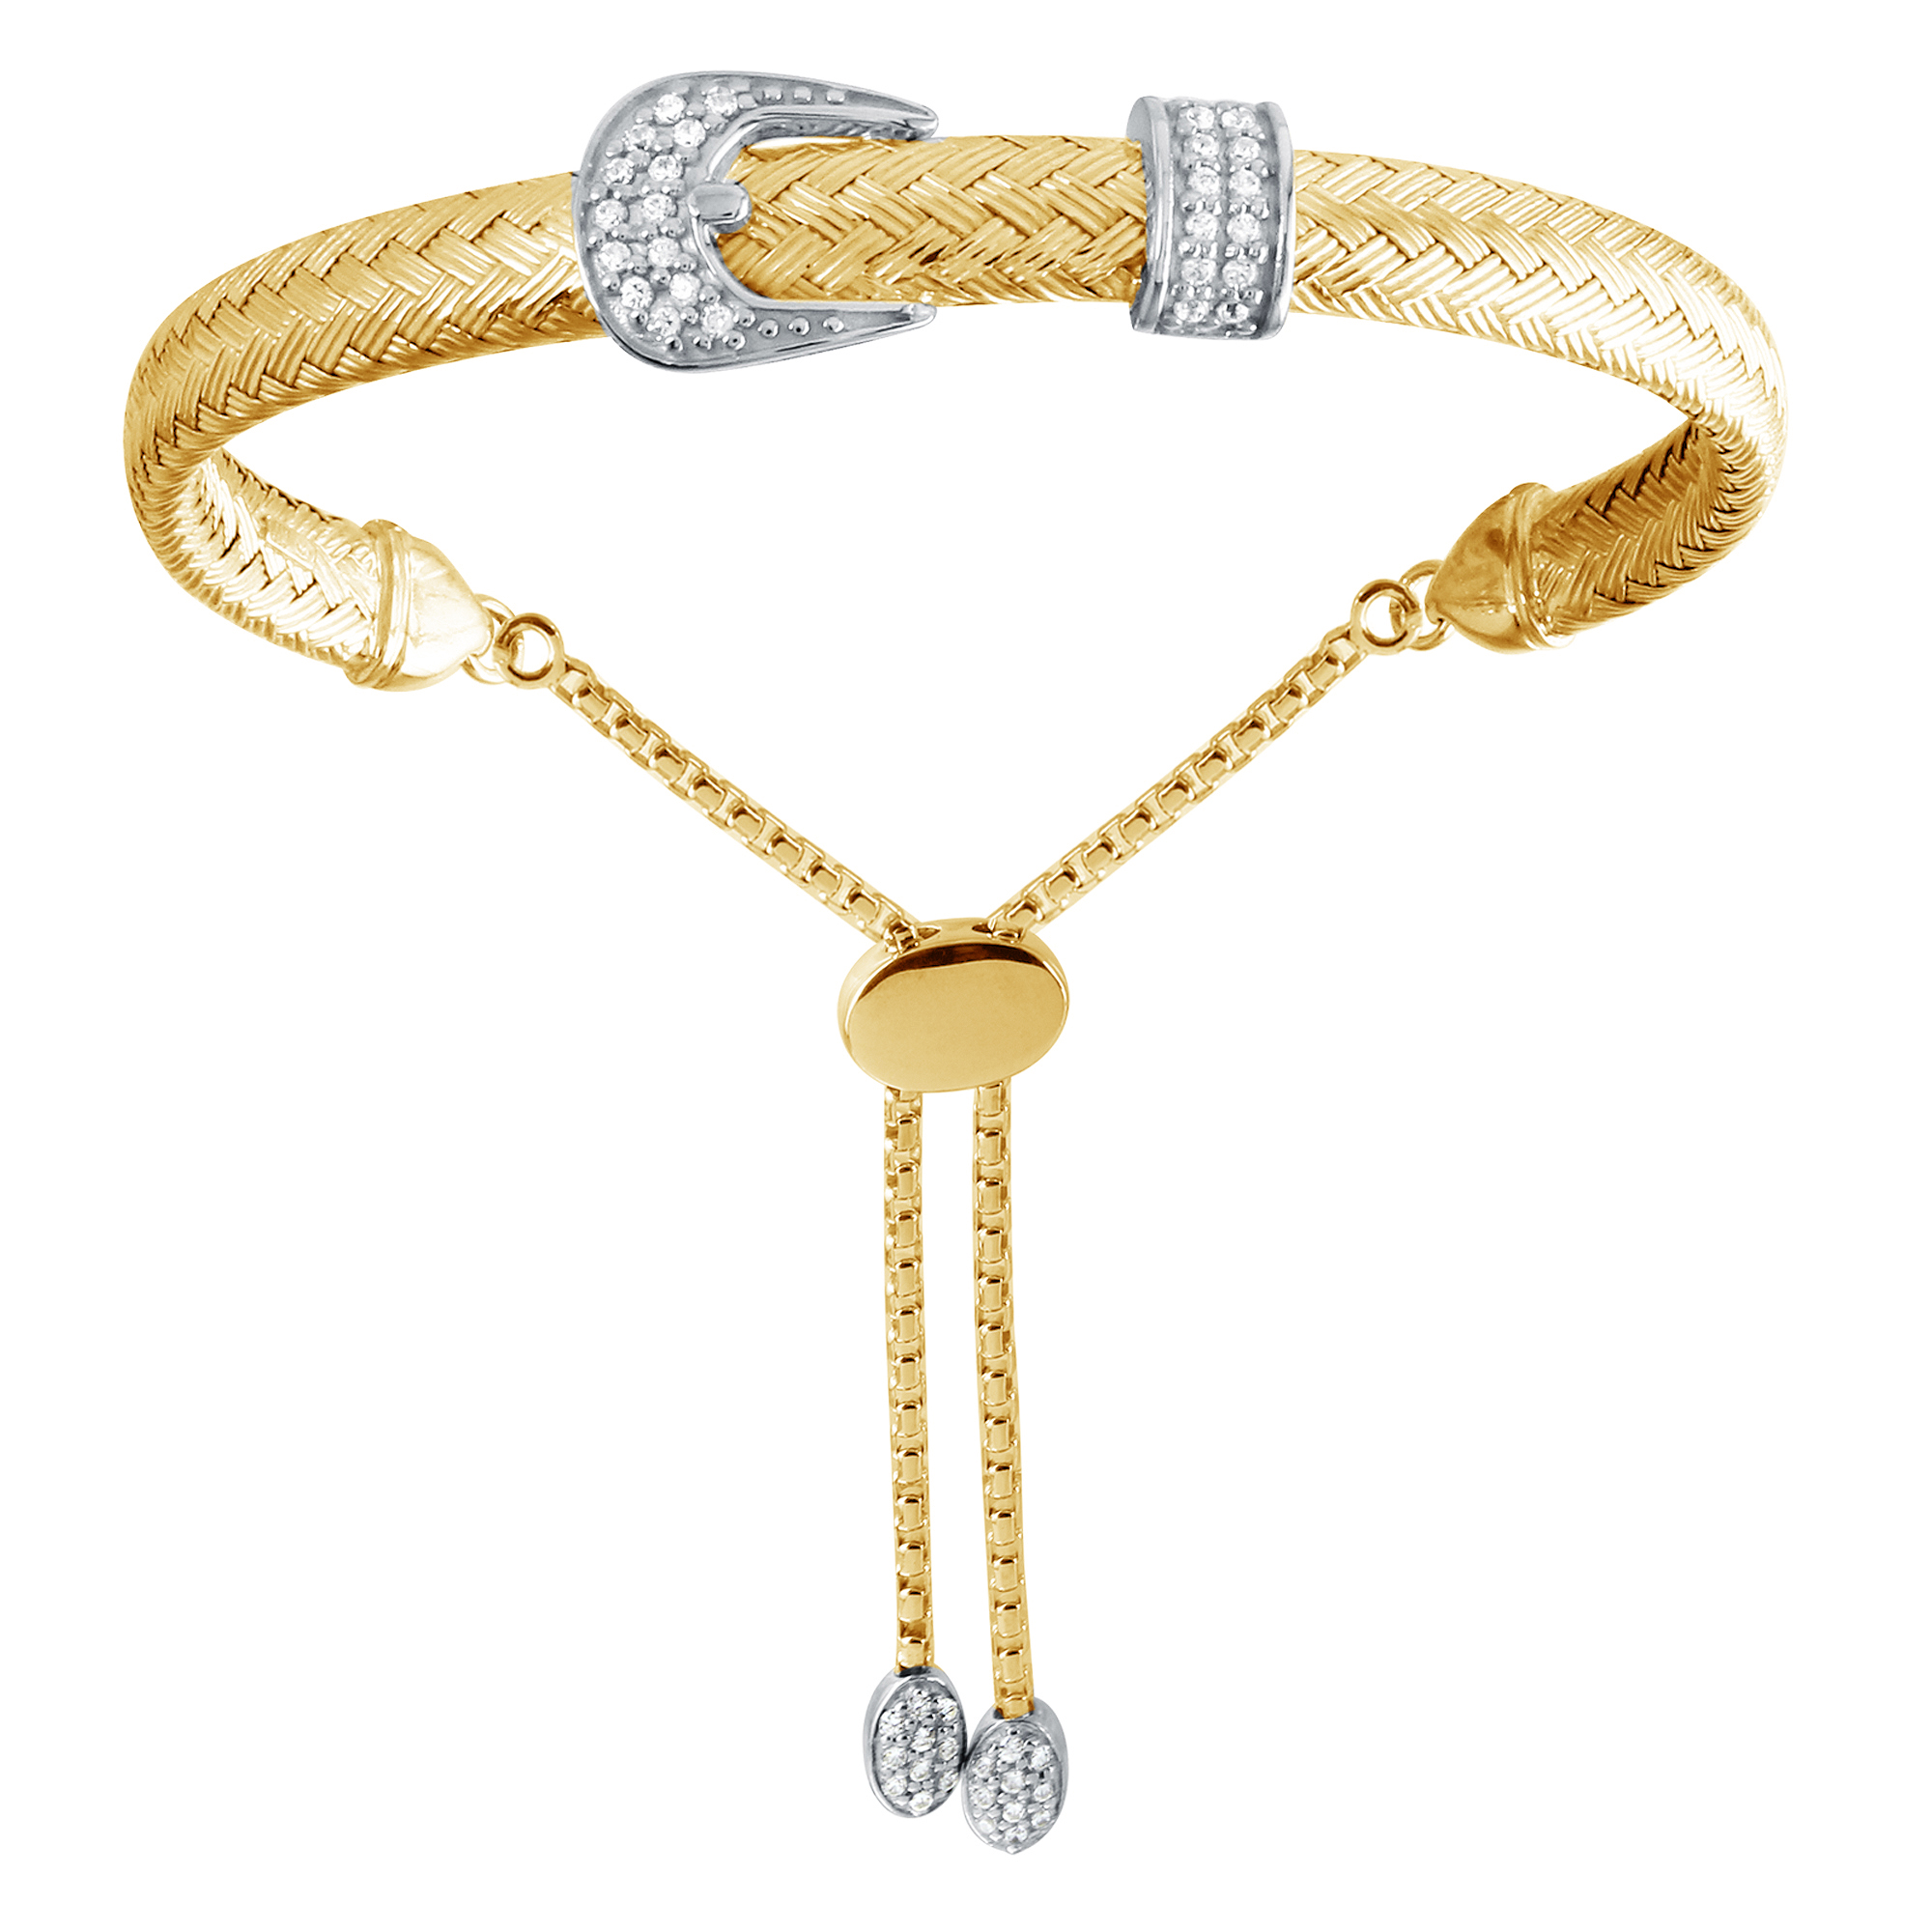 CHARLES GARNIER - Sterling Silver and CZ Buckle Bracelet